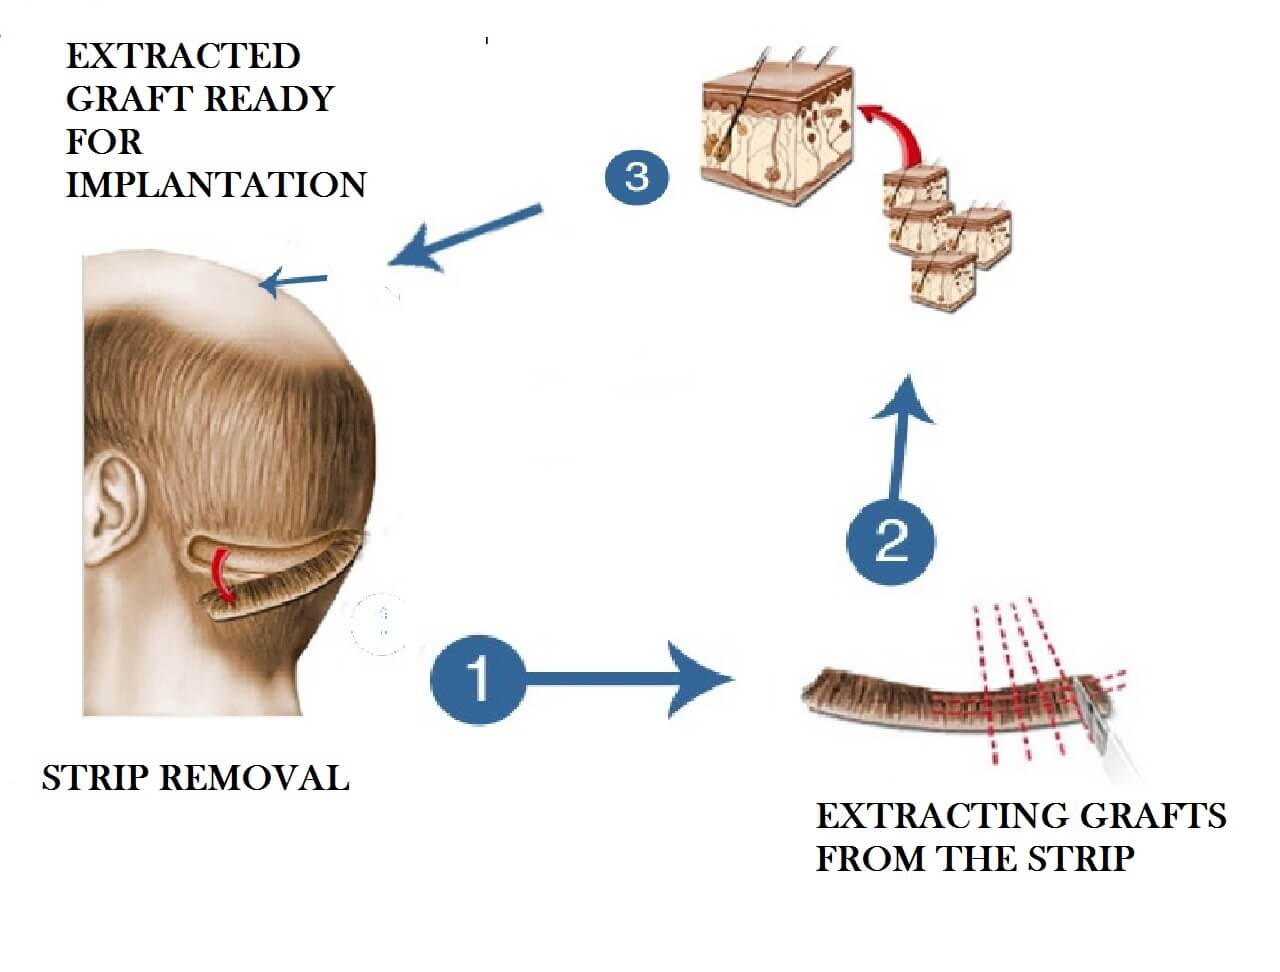 FUT (Follicular Unit Transplantation) Technique used in Delhi